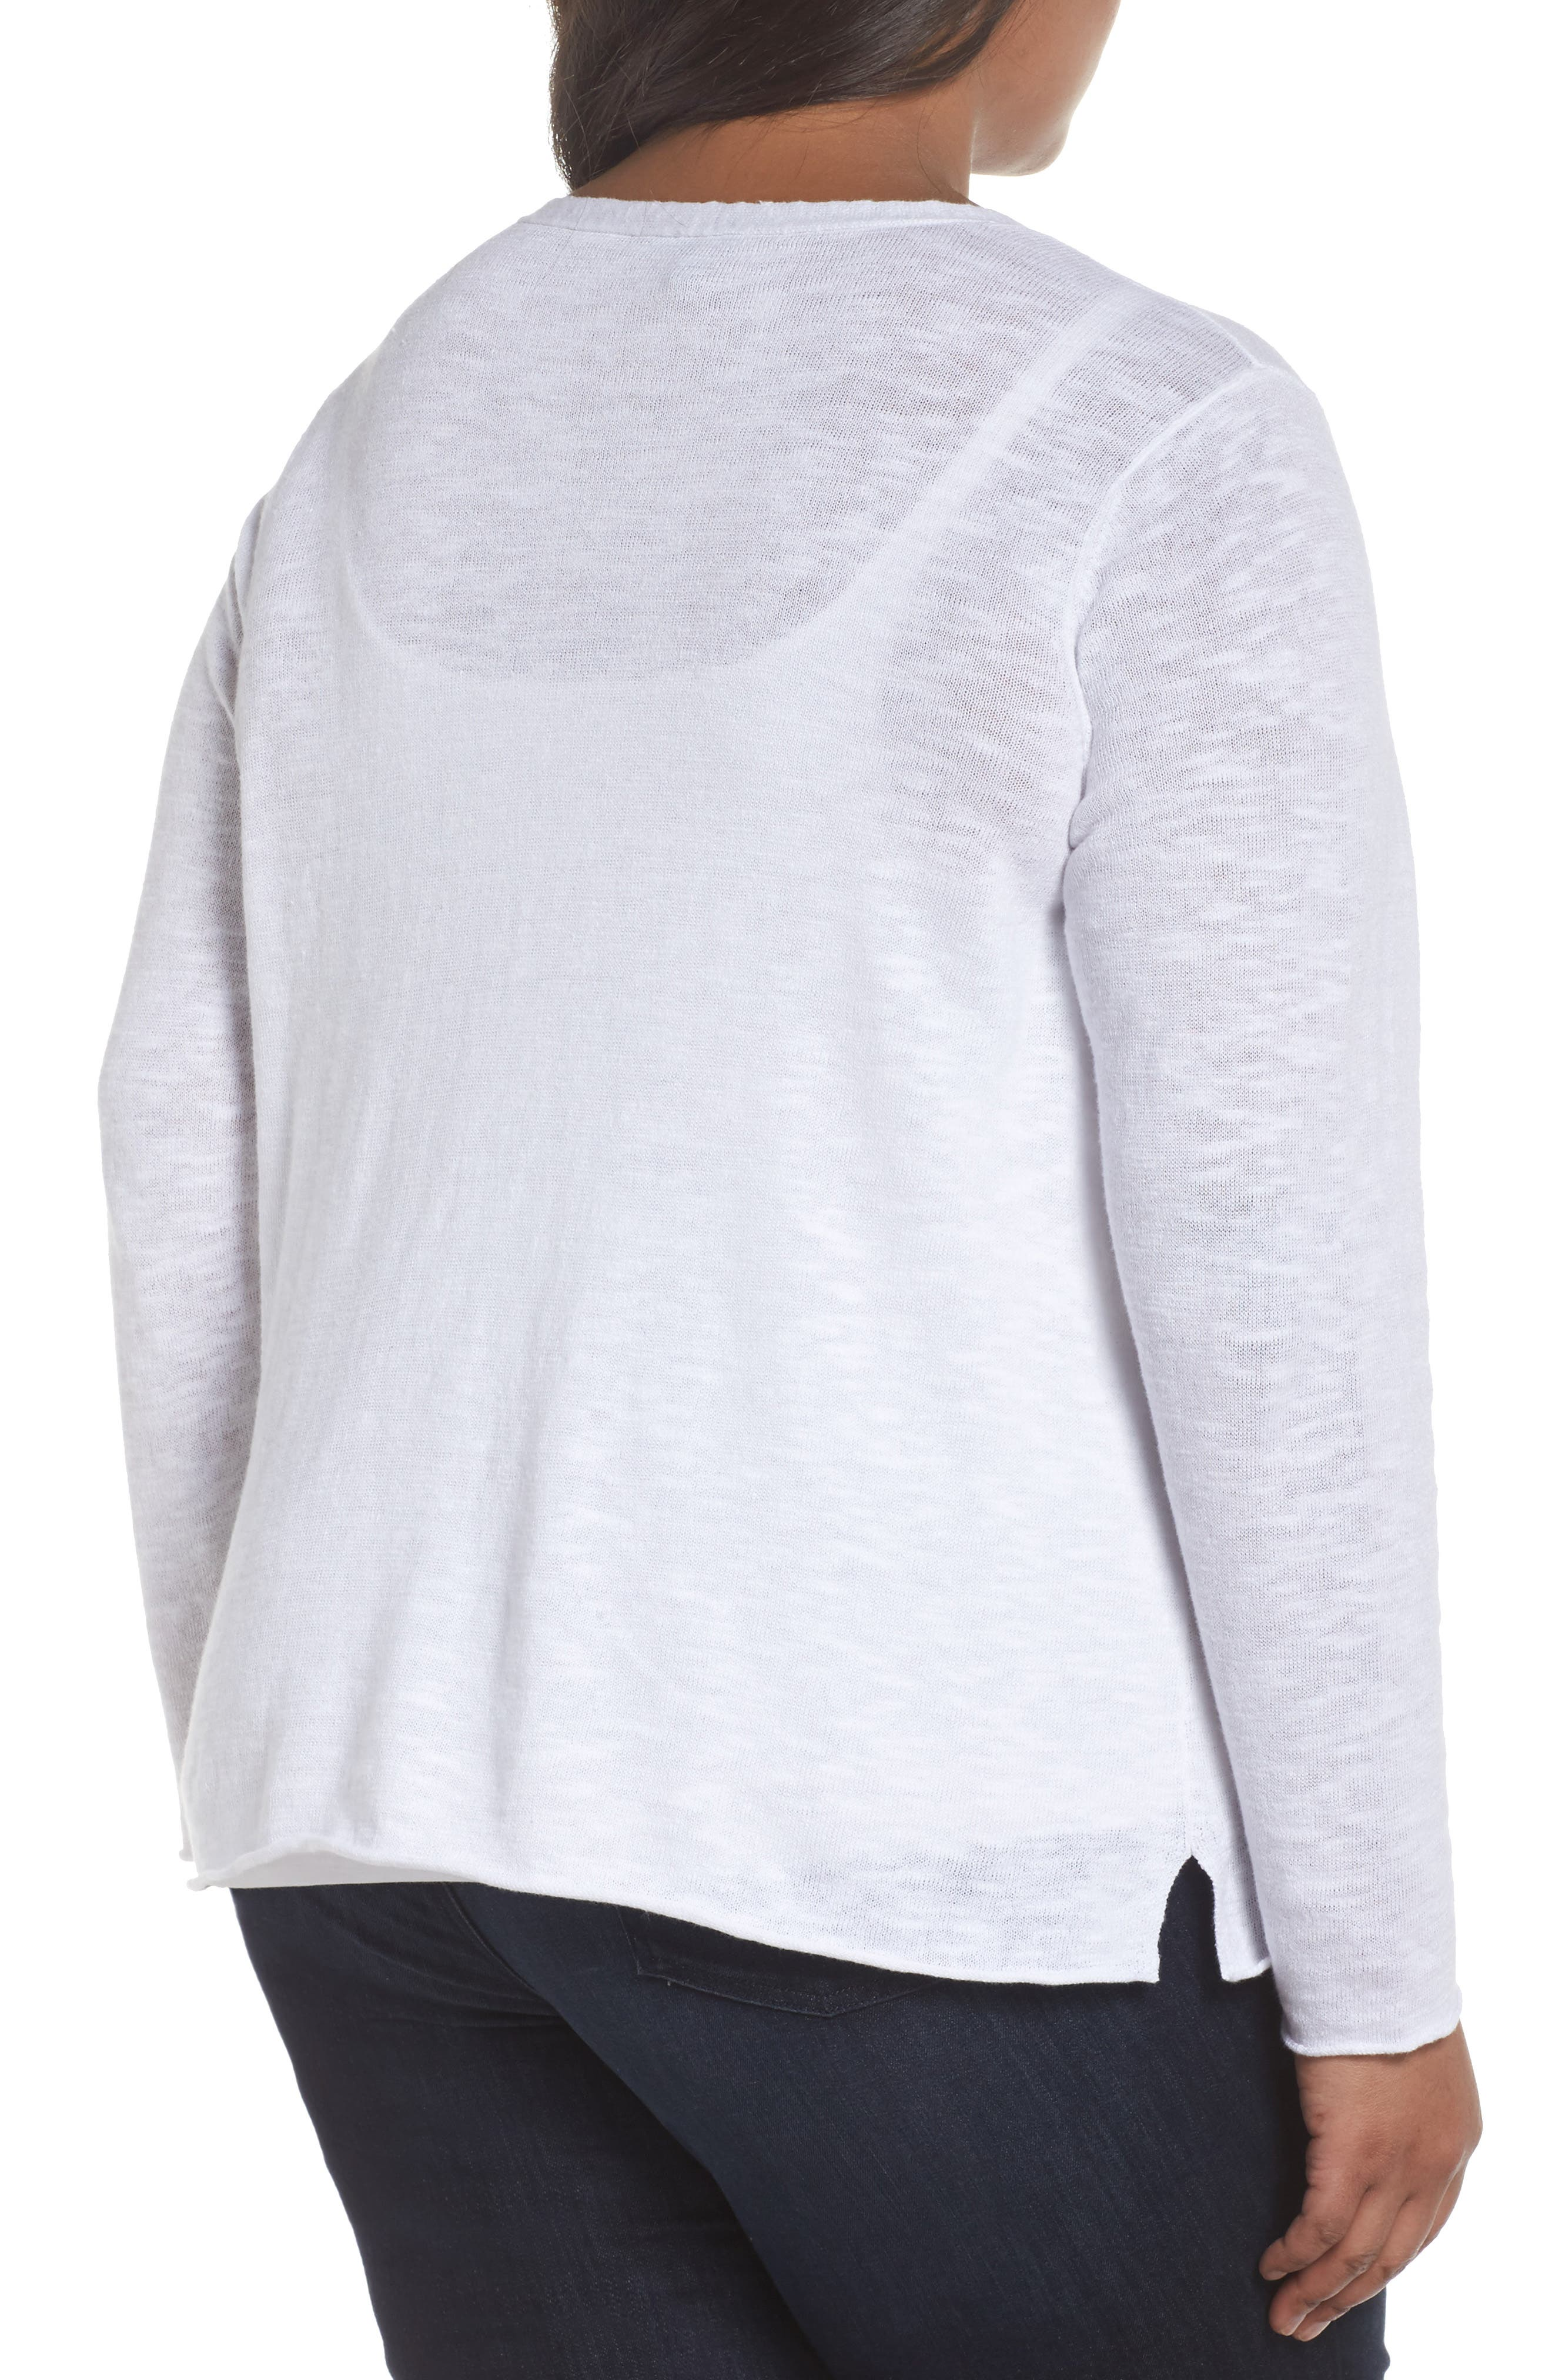 Boxy Organic Linen & Cotton Sweater,                             Alternate thumbnail 2, color,                             100